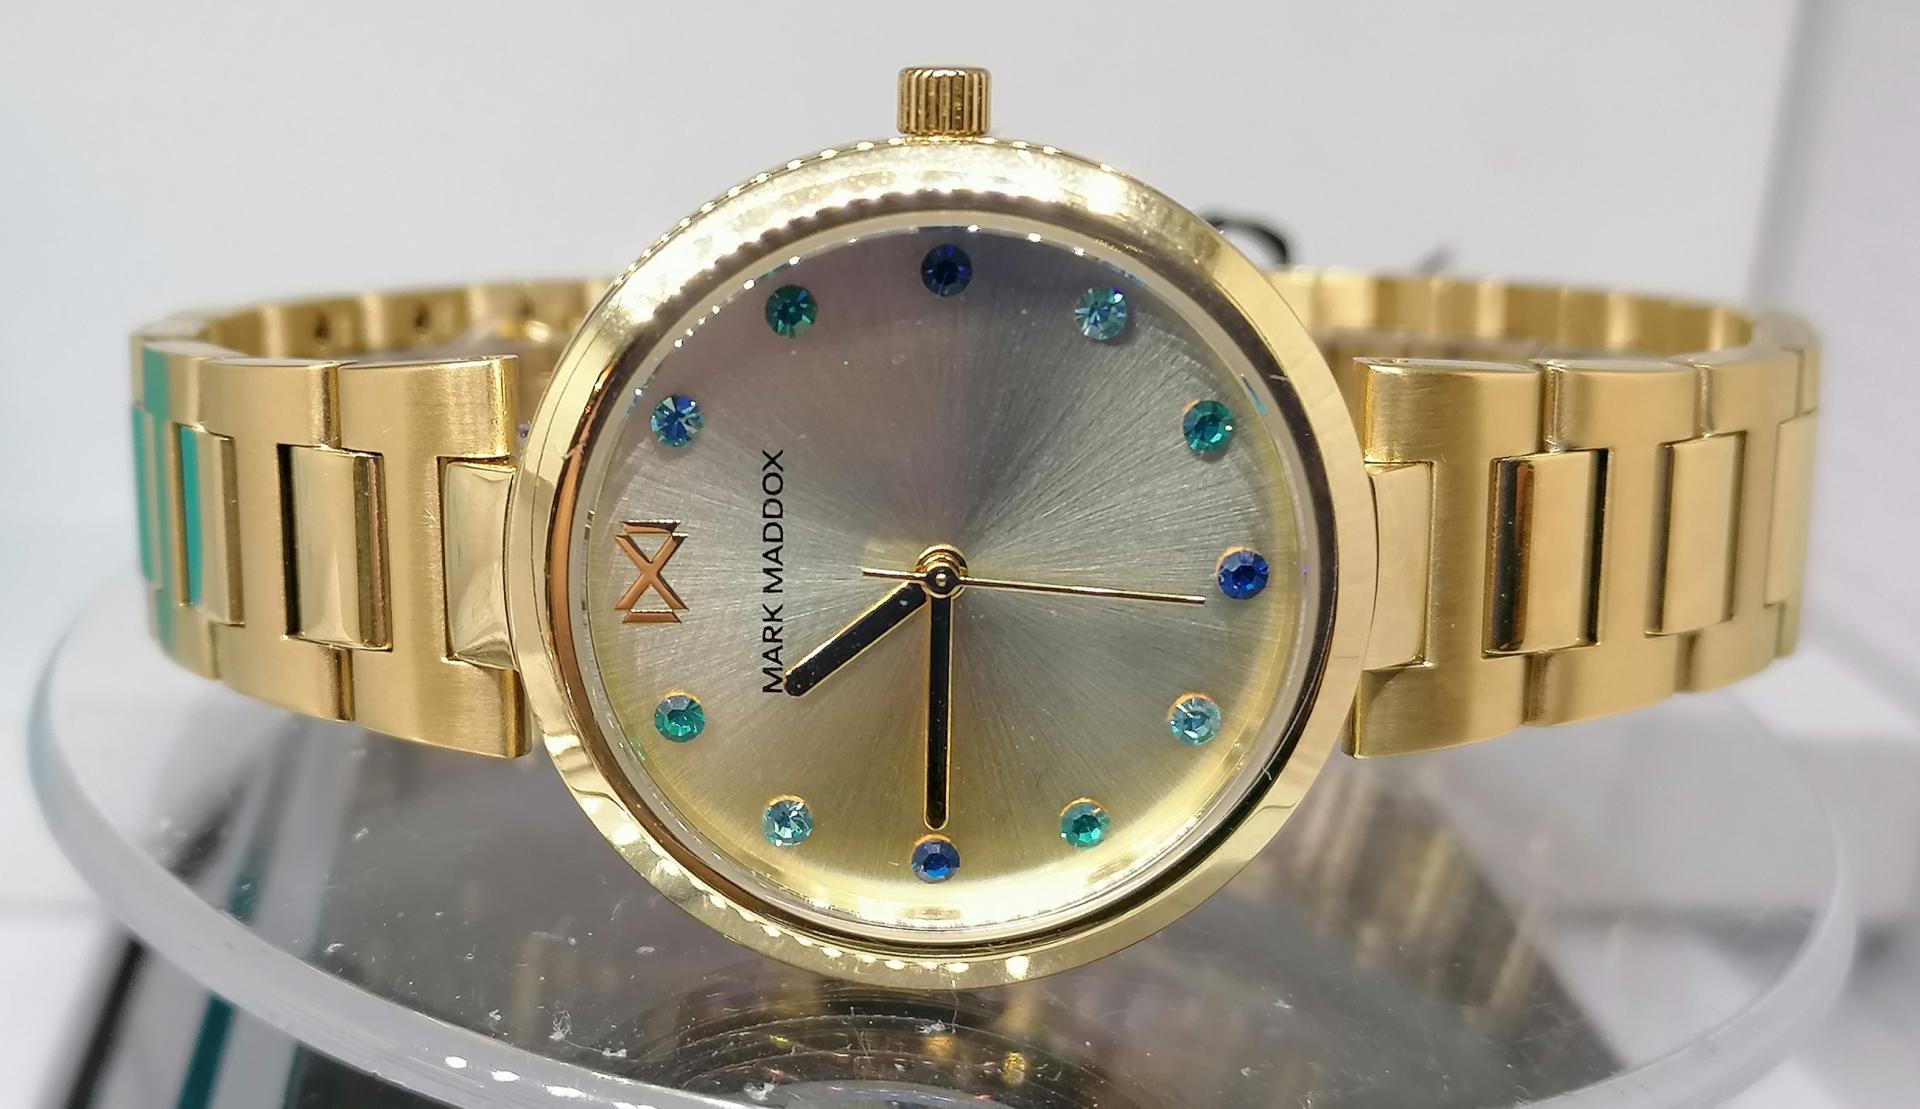 Precioso Reloj Mujer MarK Maddox Fabricado Por Viceroy MM0114-97 Dorado